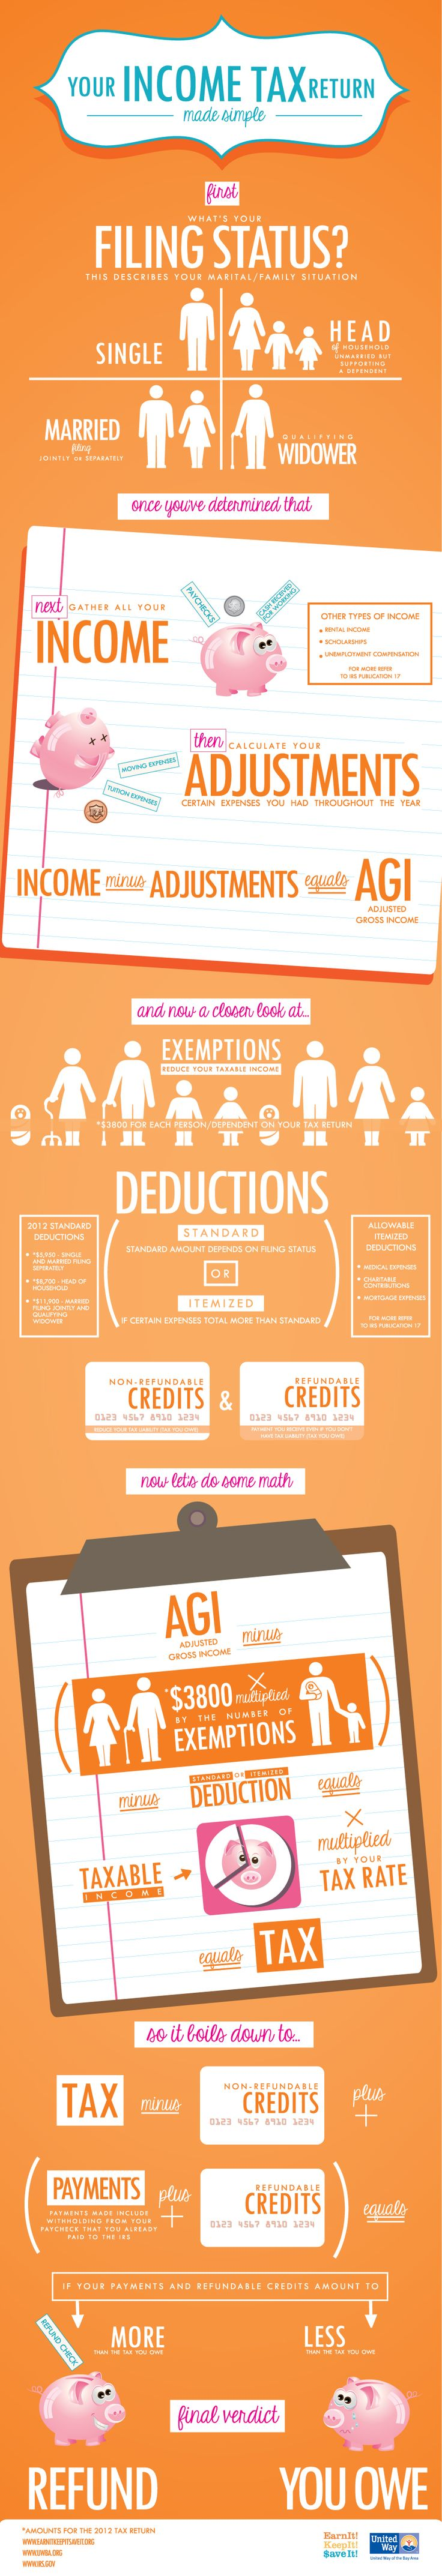 teacher income tax return form